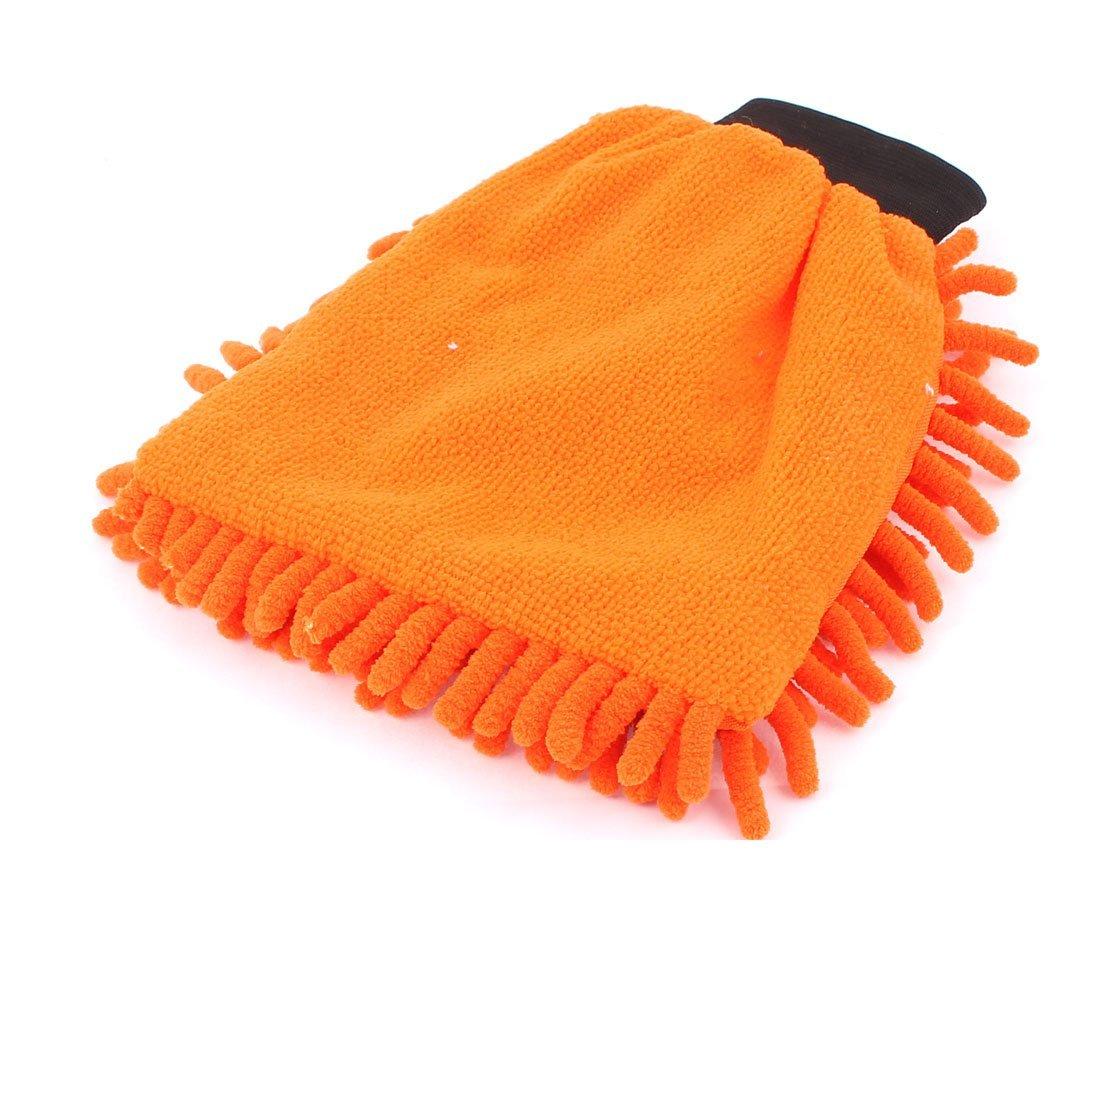 Amazon.com: eDealMax Hogar Ventana de coche de Lavado de limpieza plumero Toalla Mitt Guante de Orange: Automotive